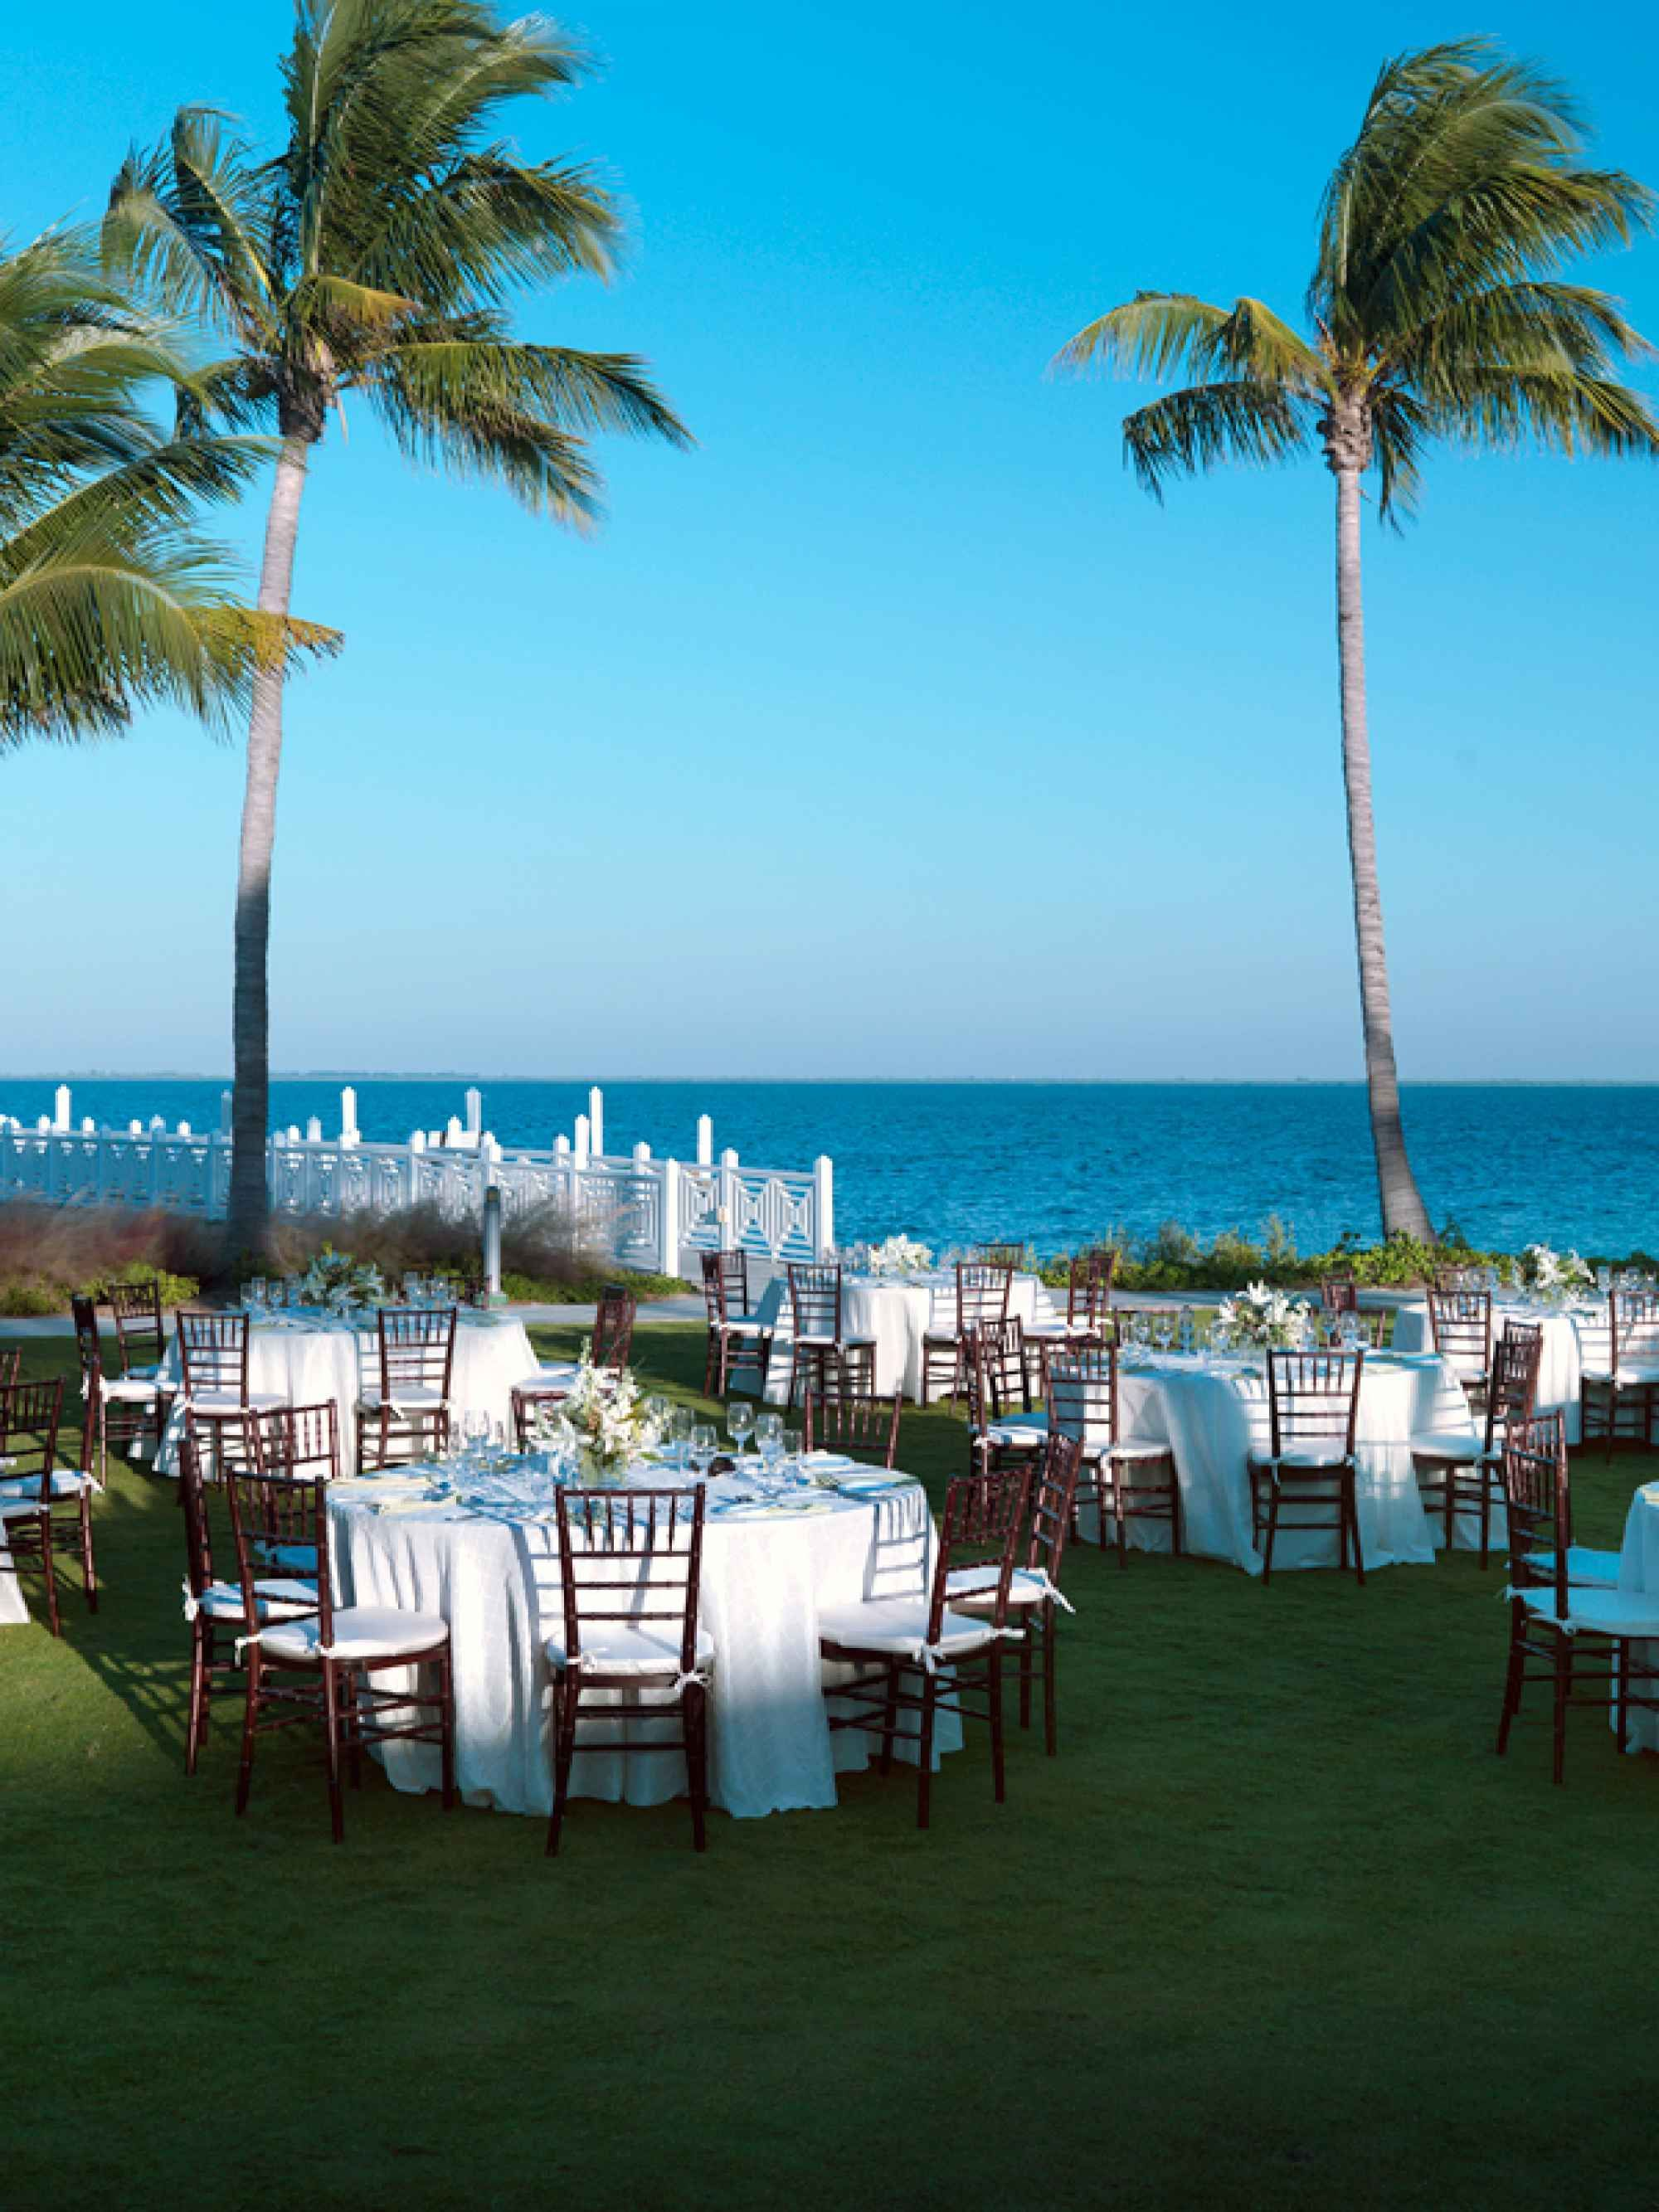 beach weddings top florida wedding venues for florida destination weddings best